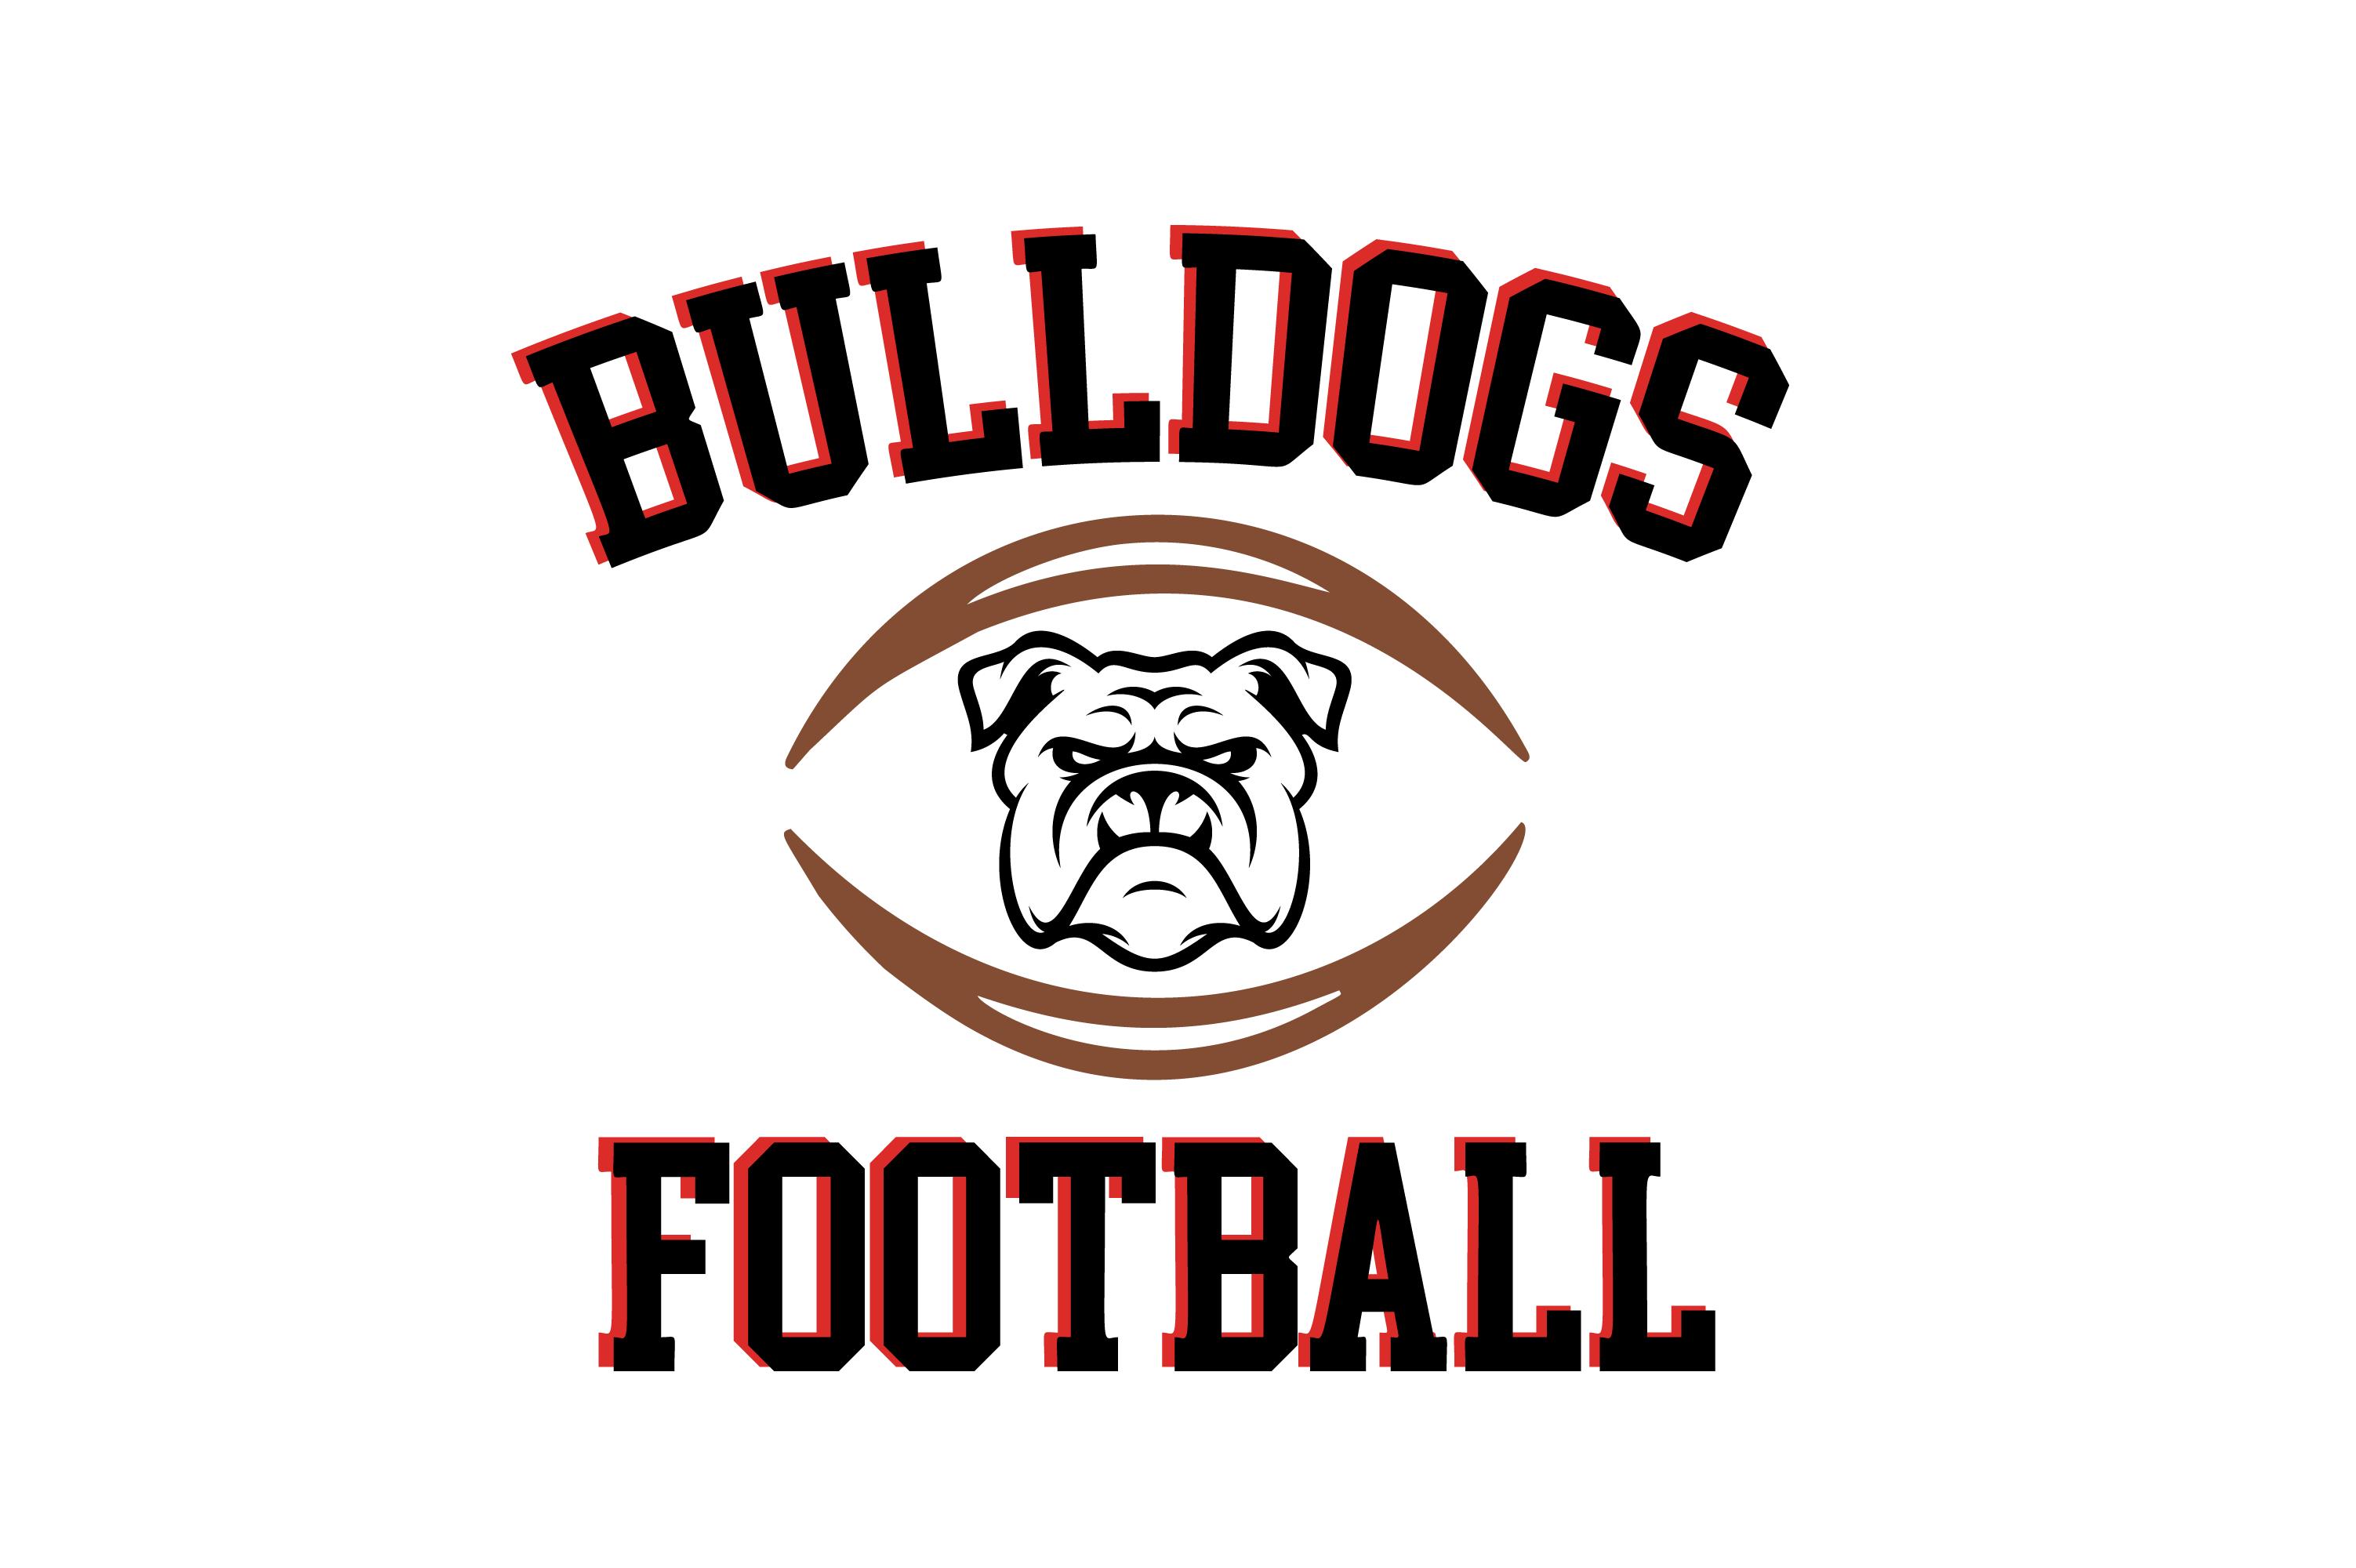 Bulldogs Football High School Mascot SVG (Graphic) by